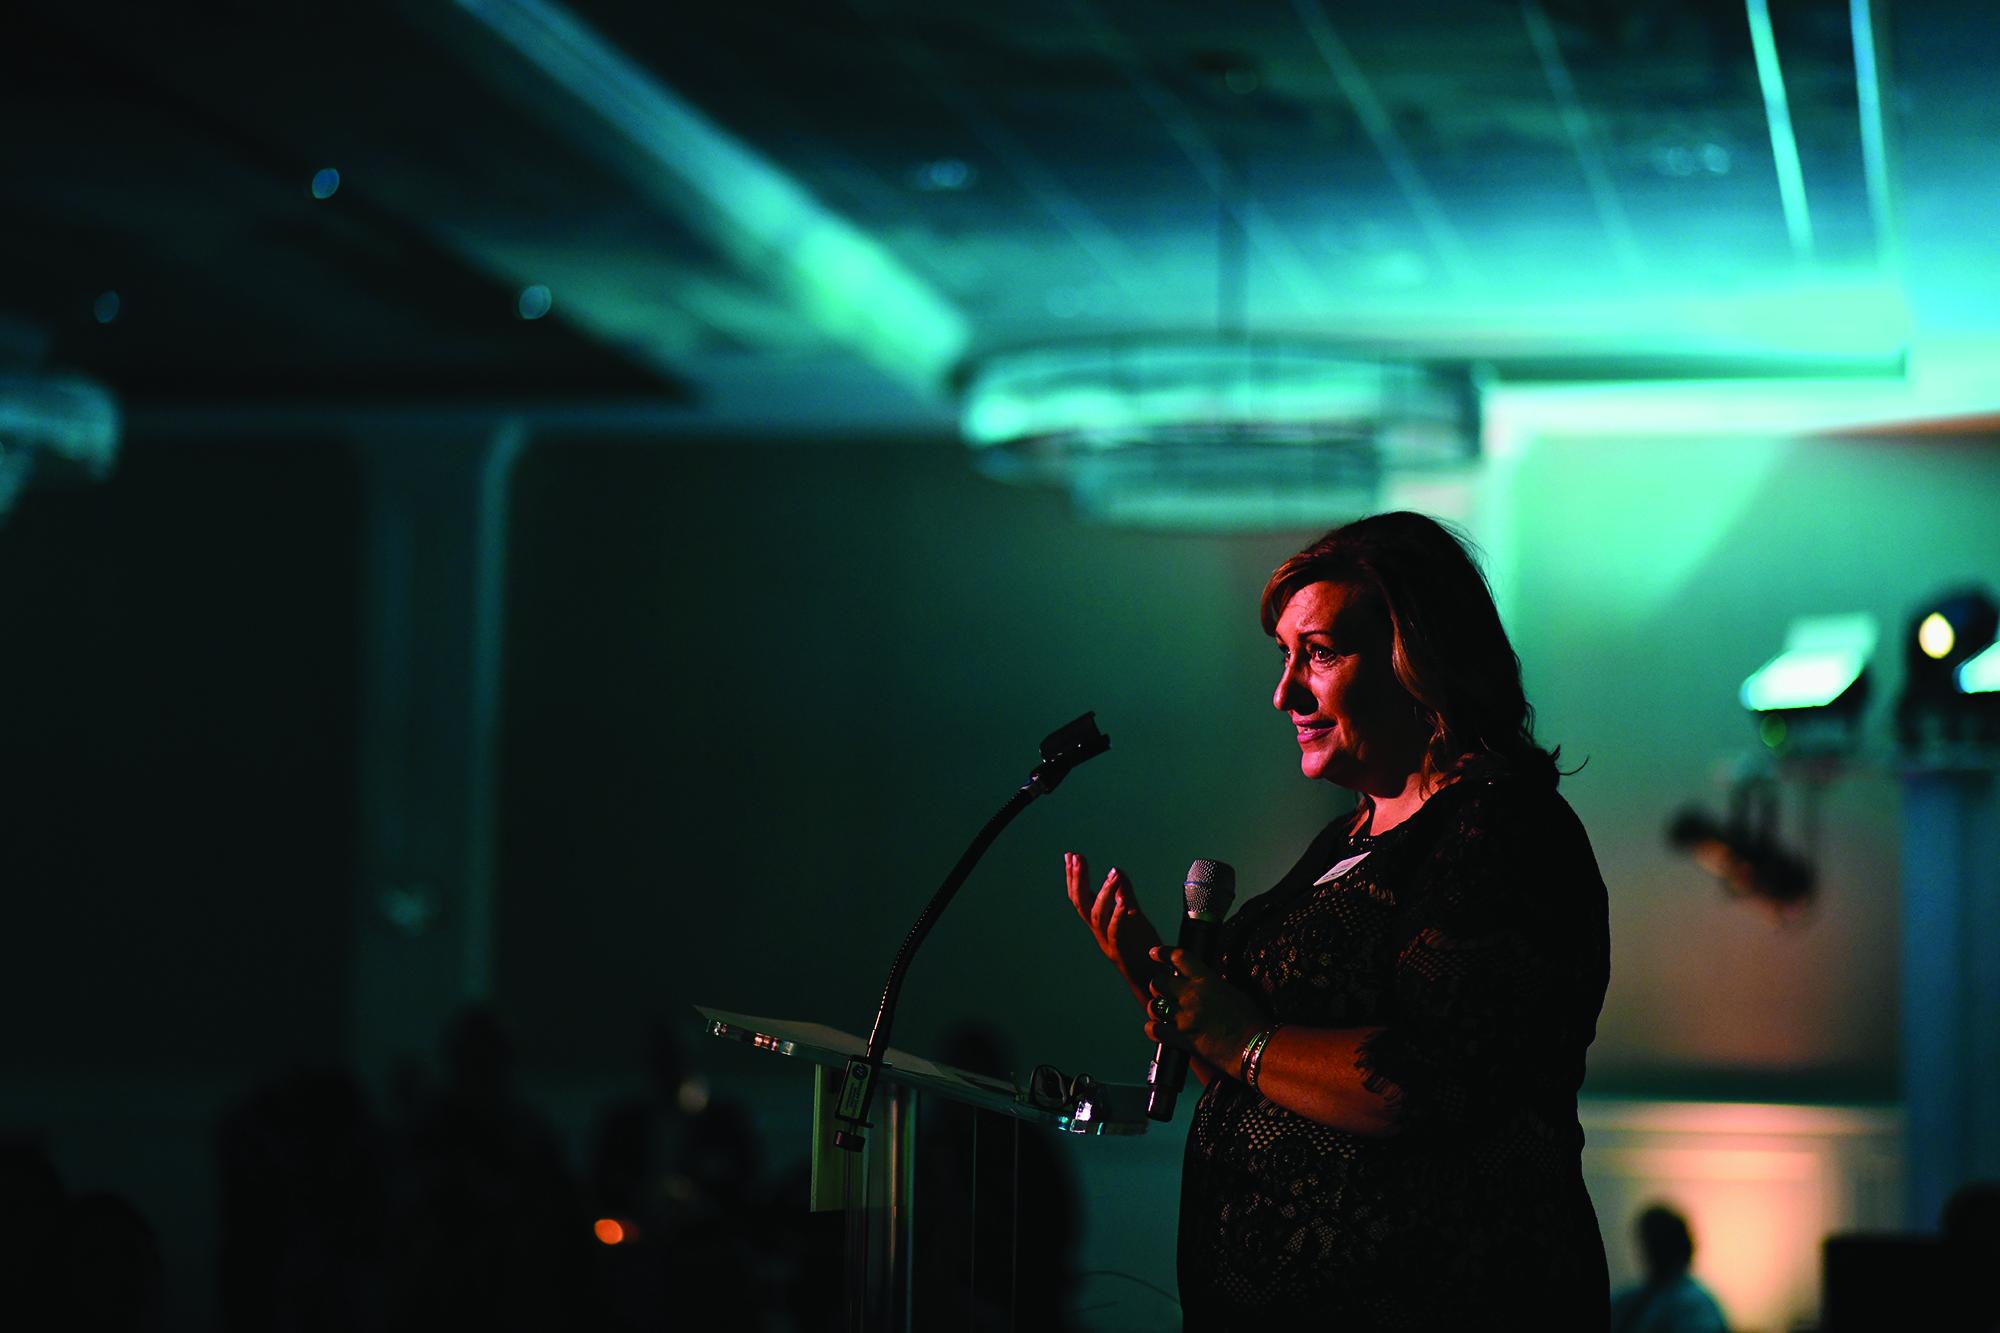 lori waltz gagnon speaking at event